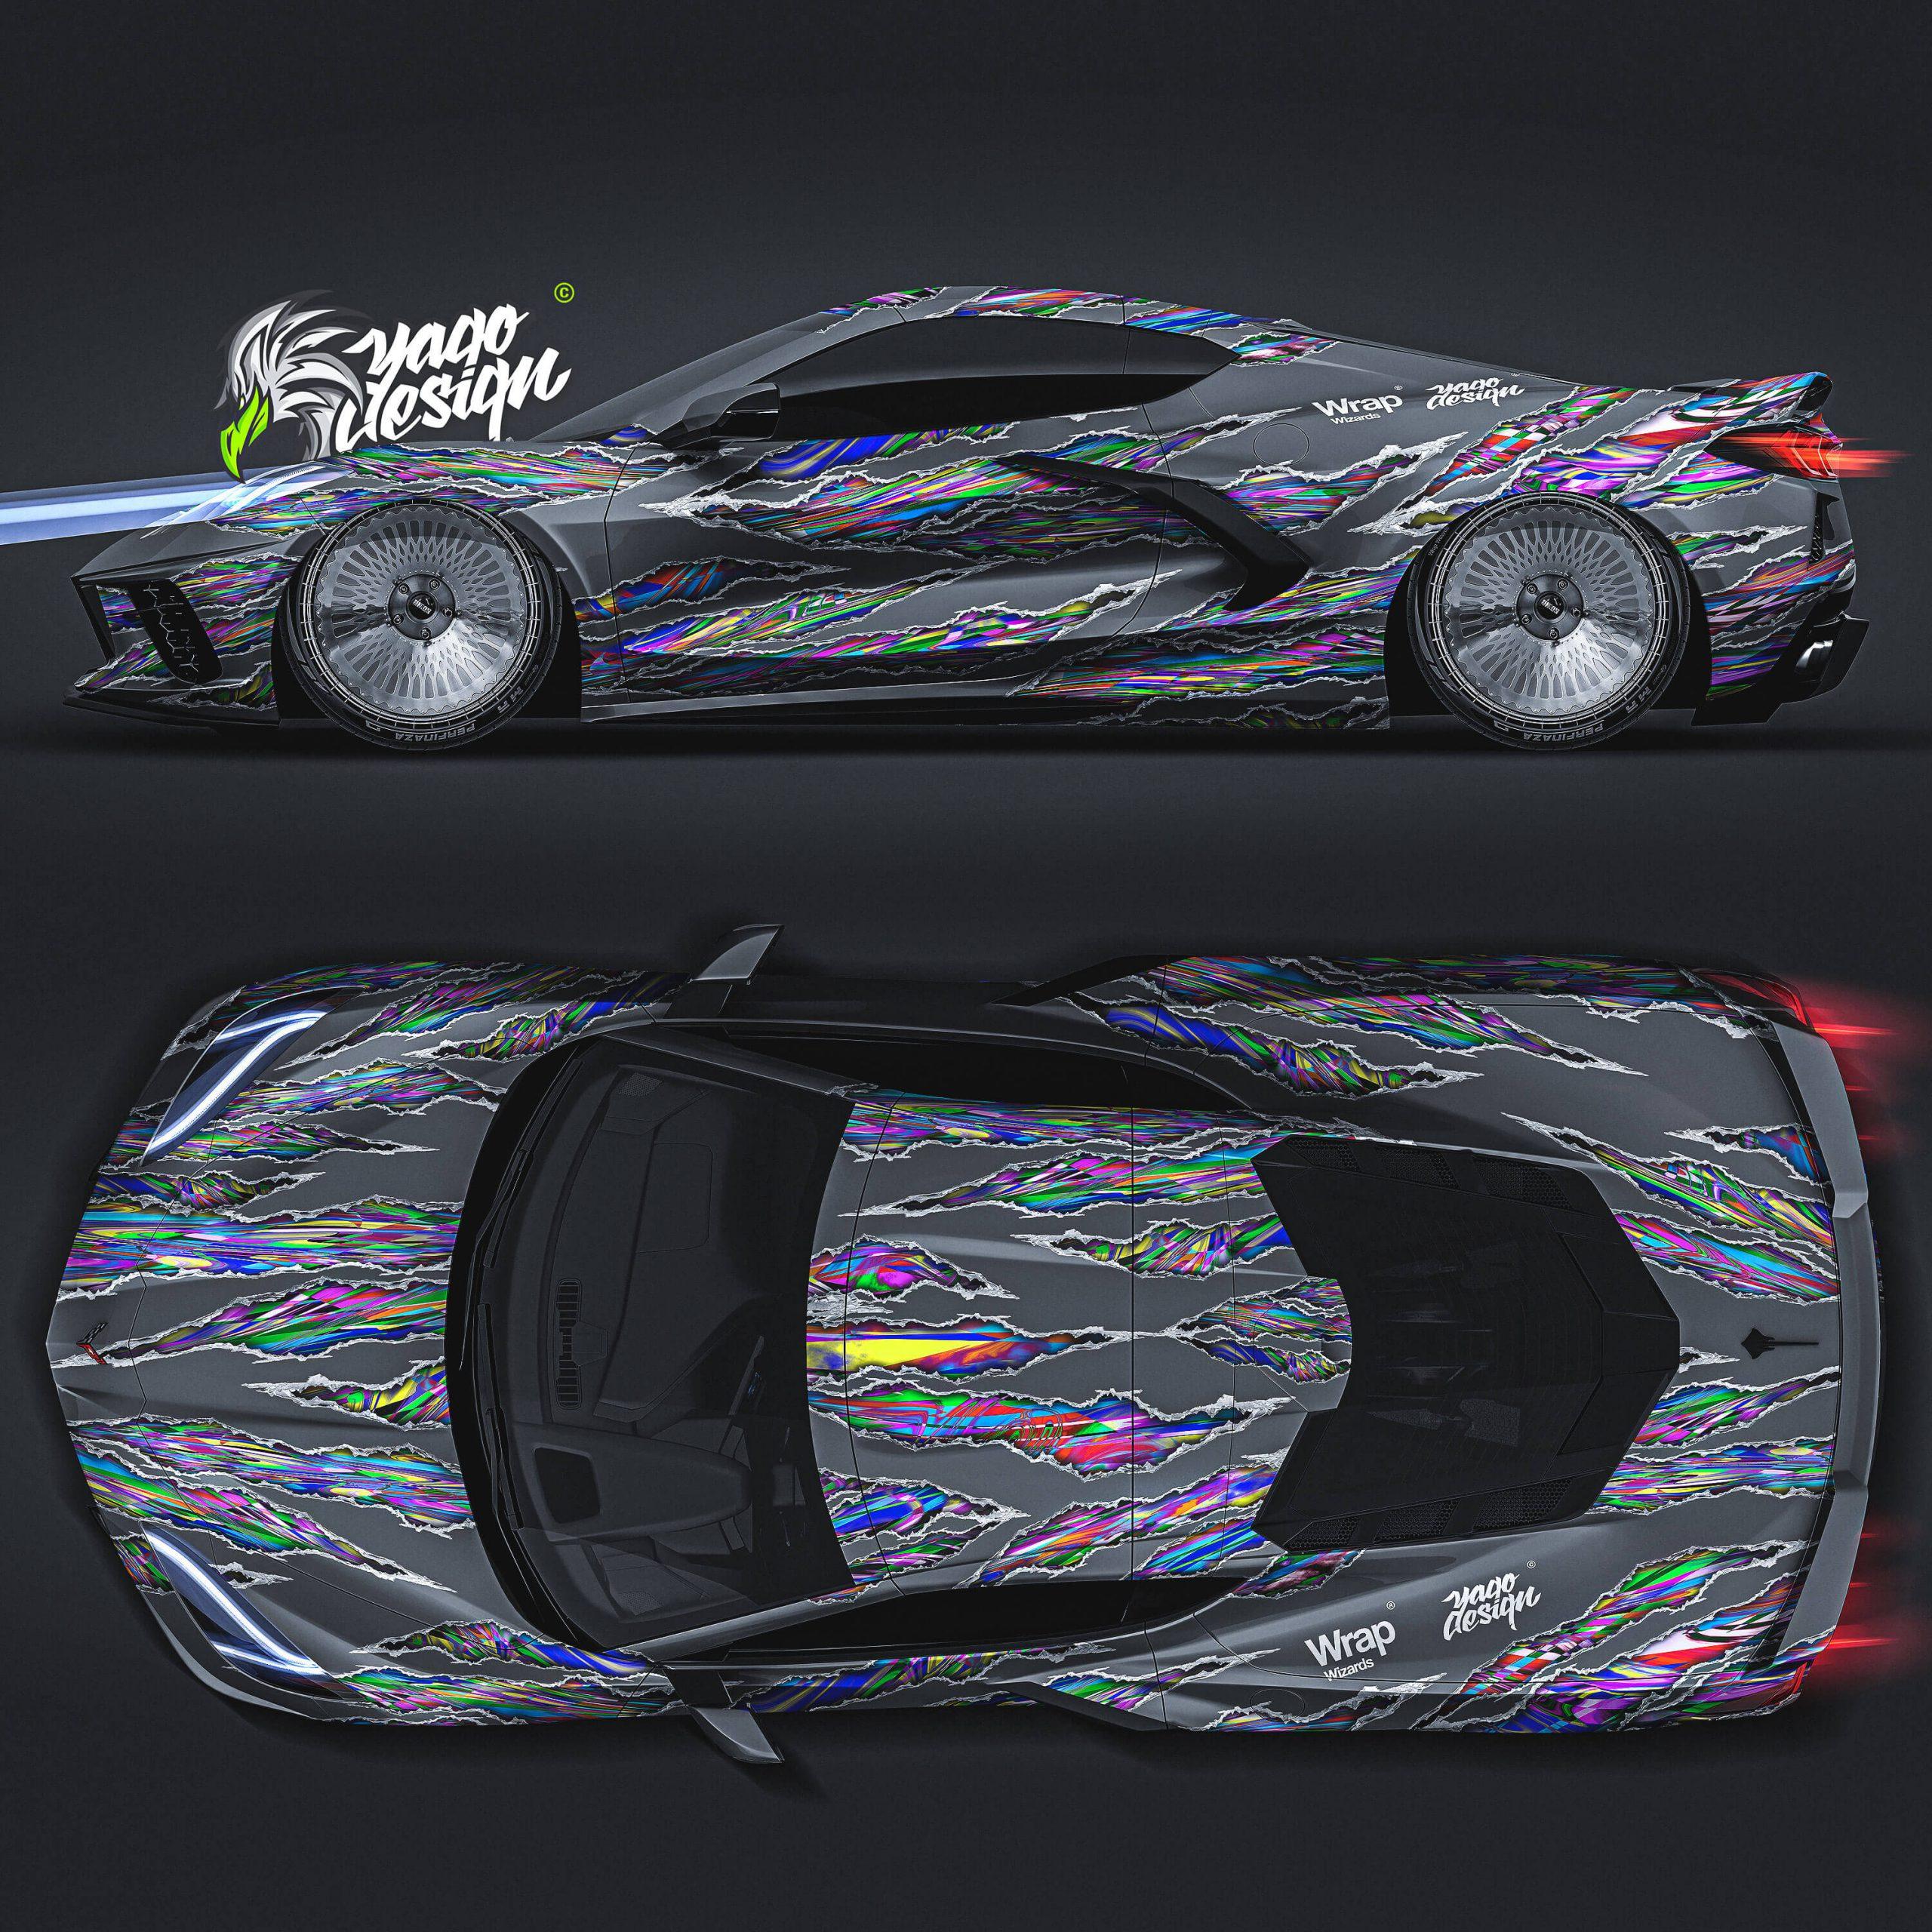 Chevrolet-Corvette-C8-Stingray-2020-by-Yagodesign-2019-scaled